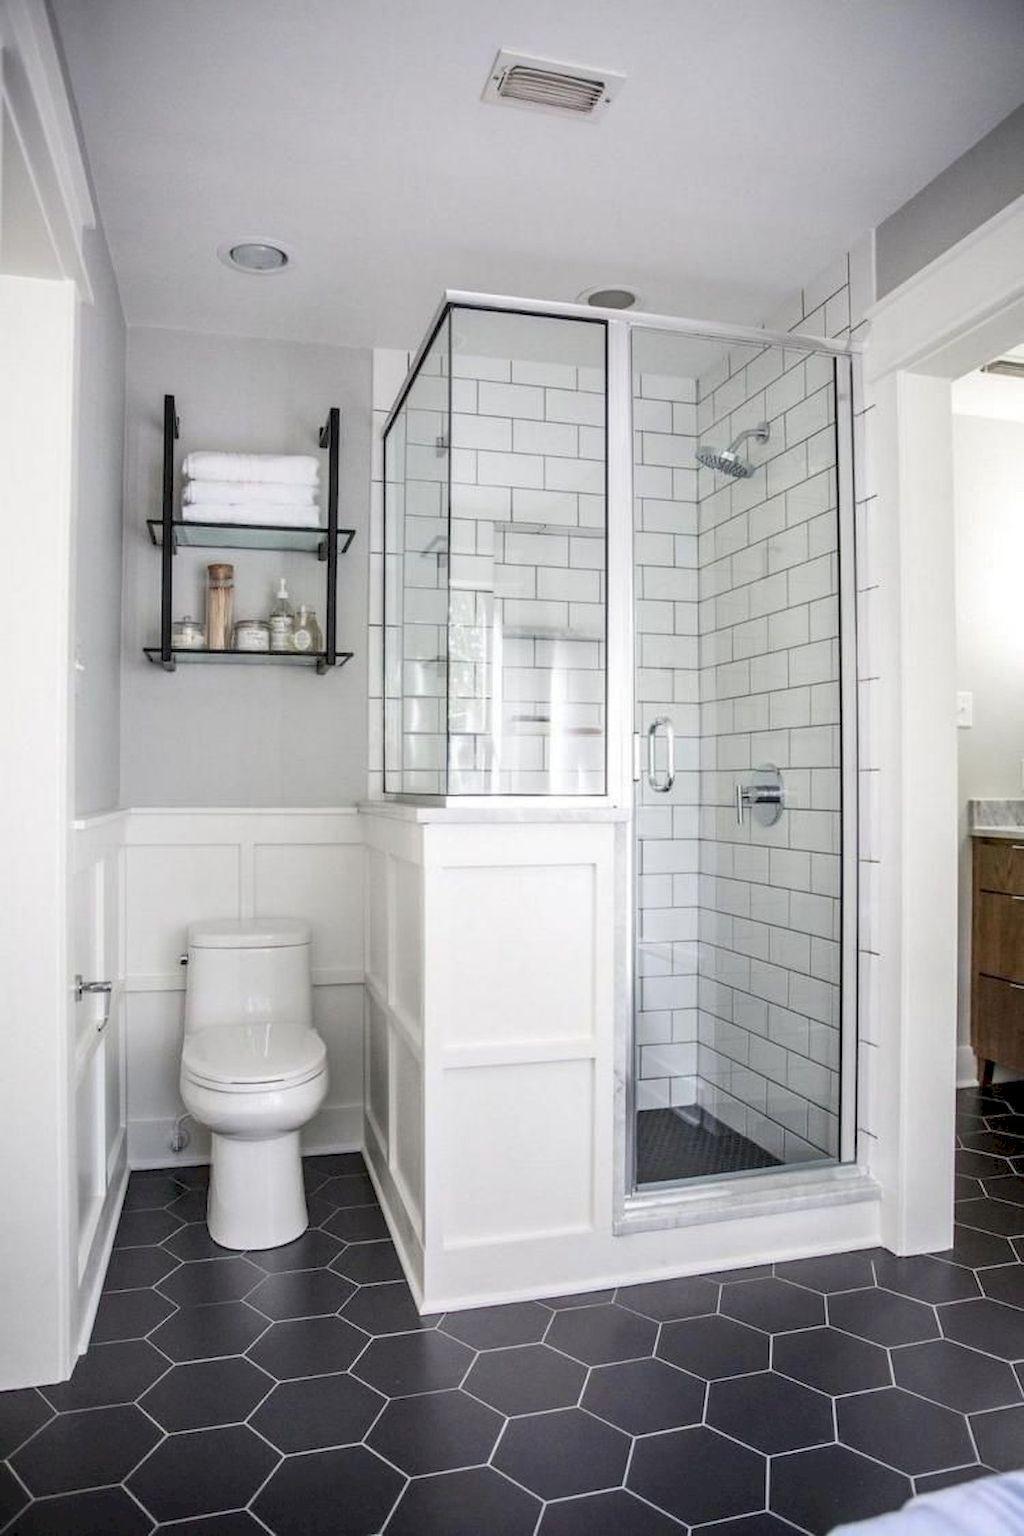 Small Bathroom Remodel Design Ideas On A Budget (25) - Home Design